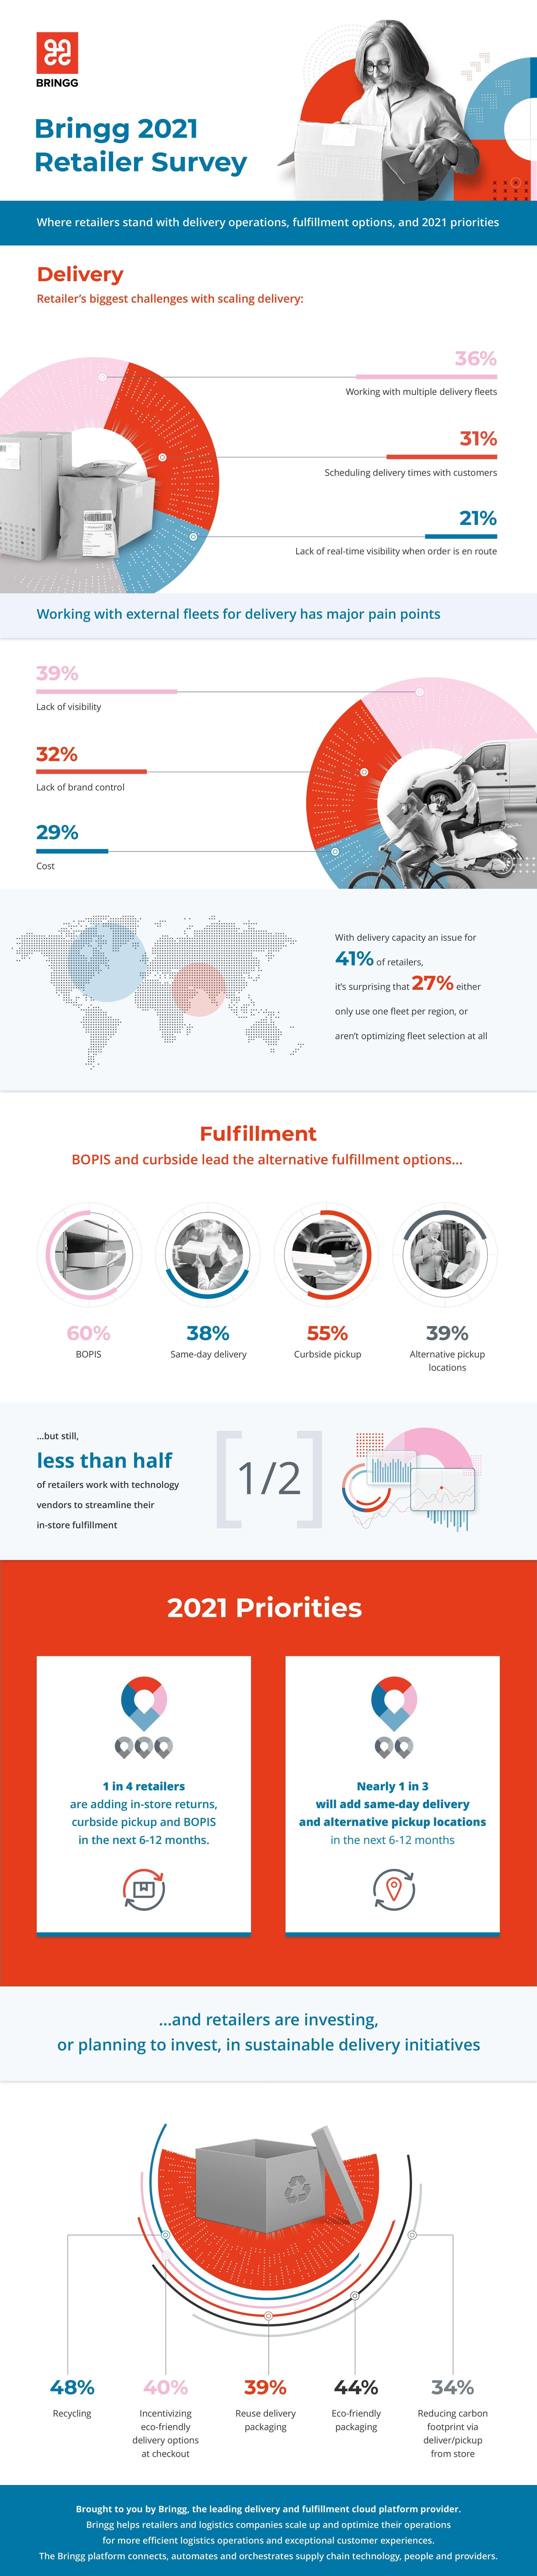 Infographic: 2021 Bringg Retailer Survey